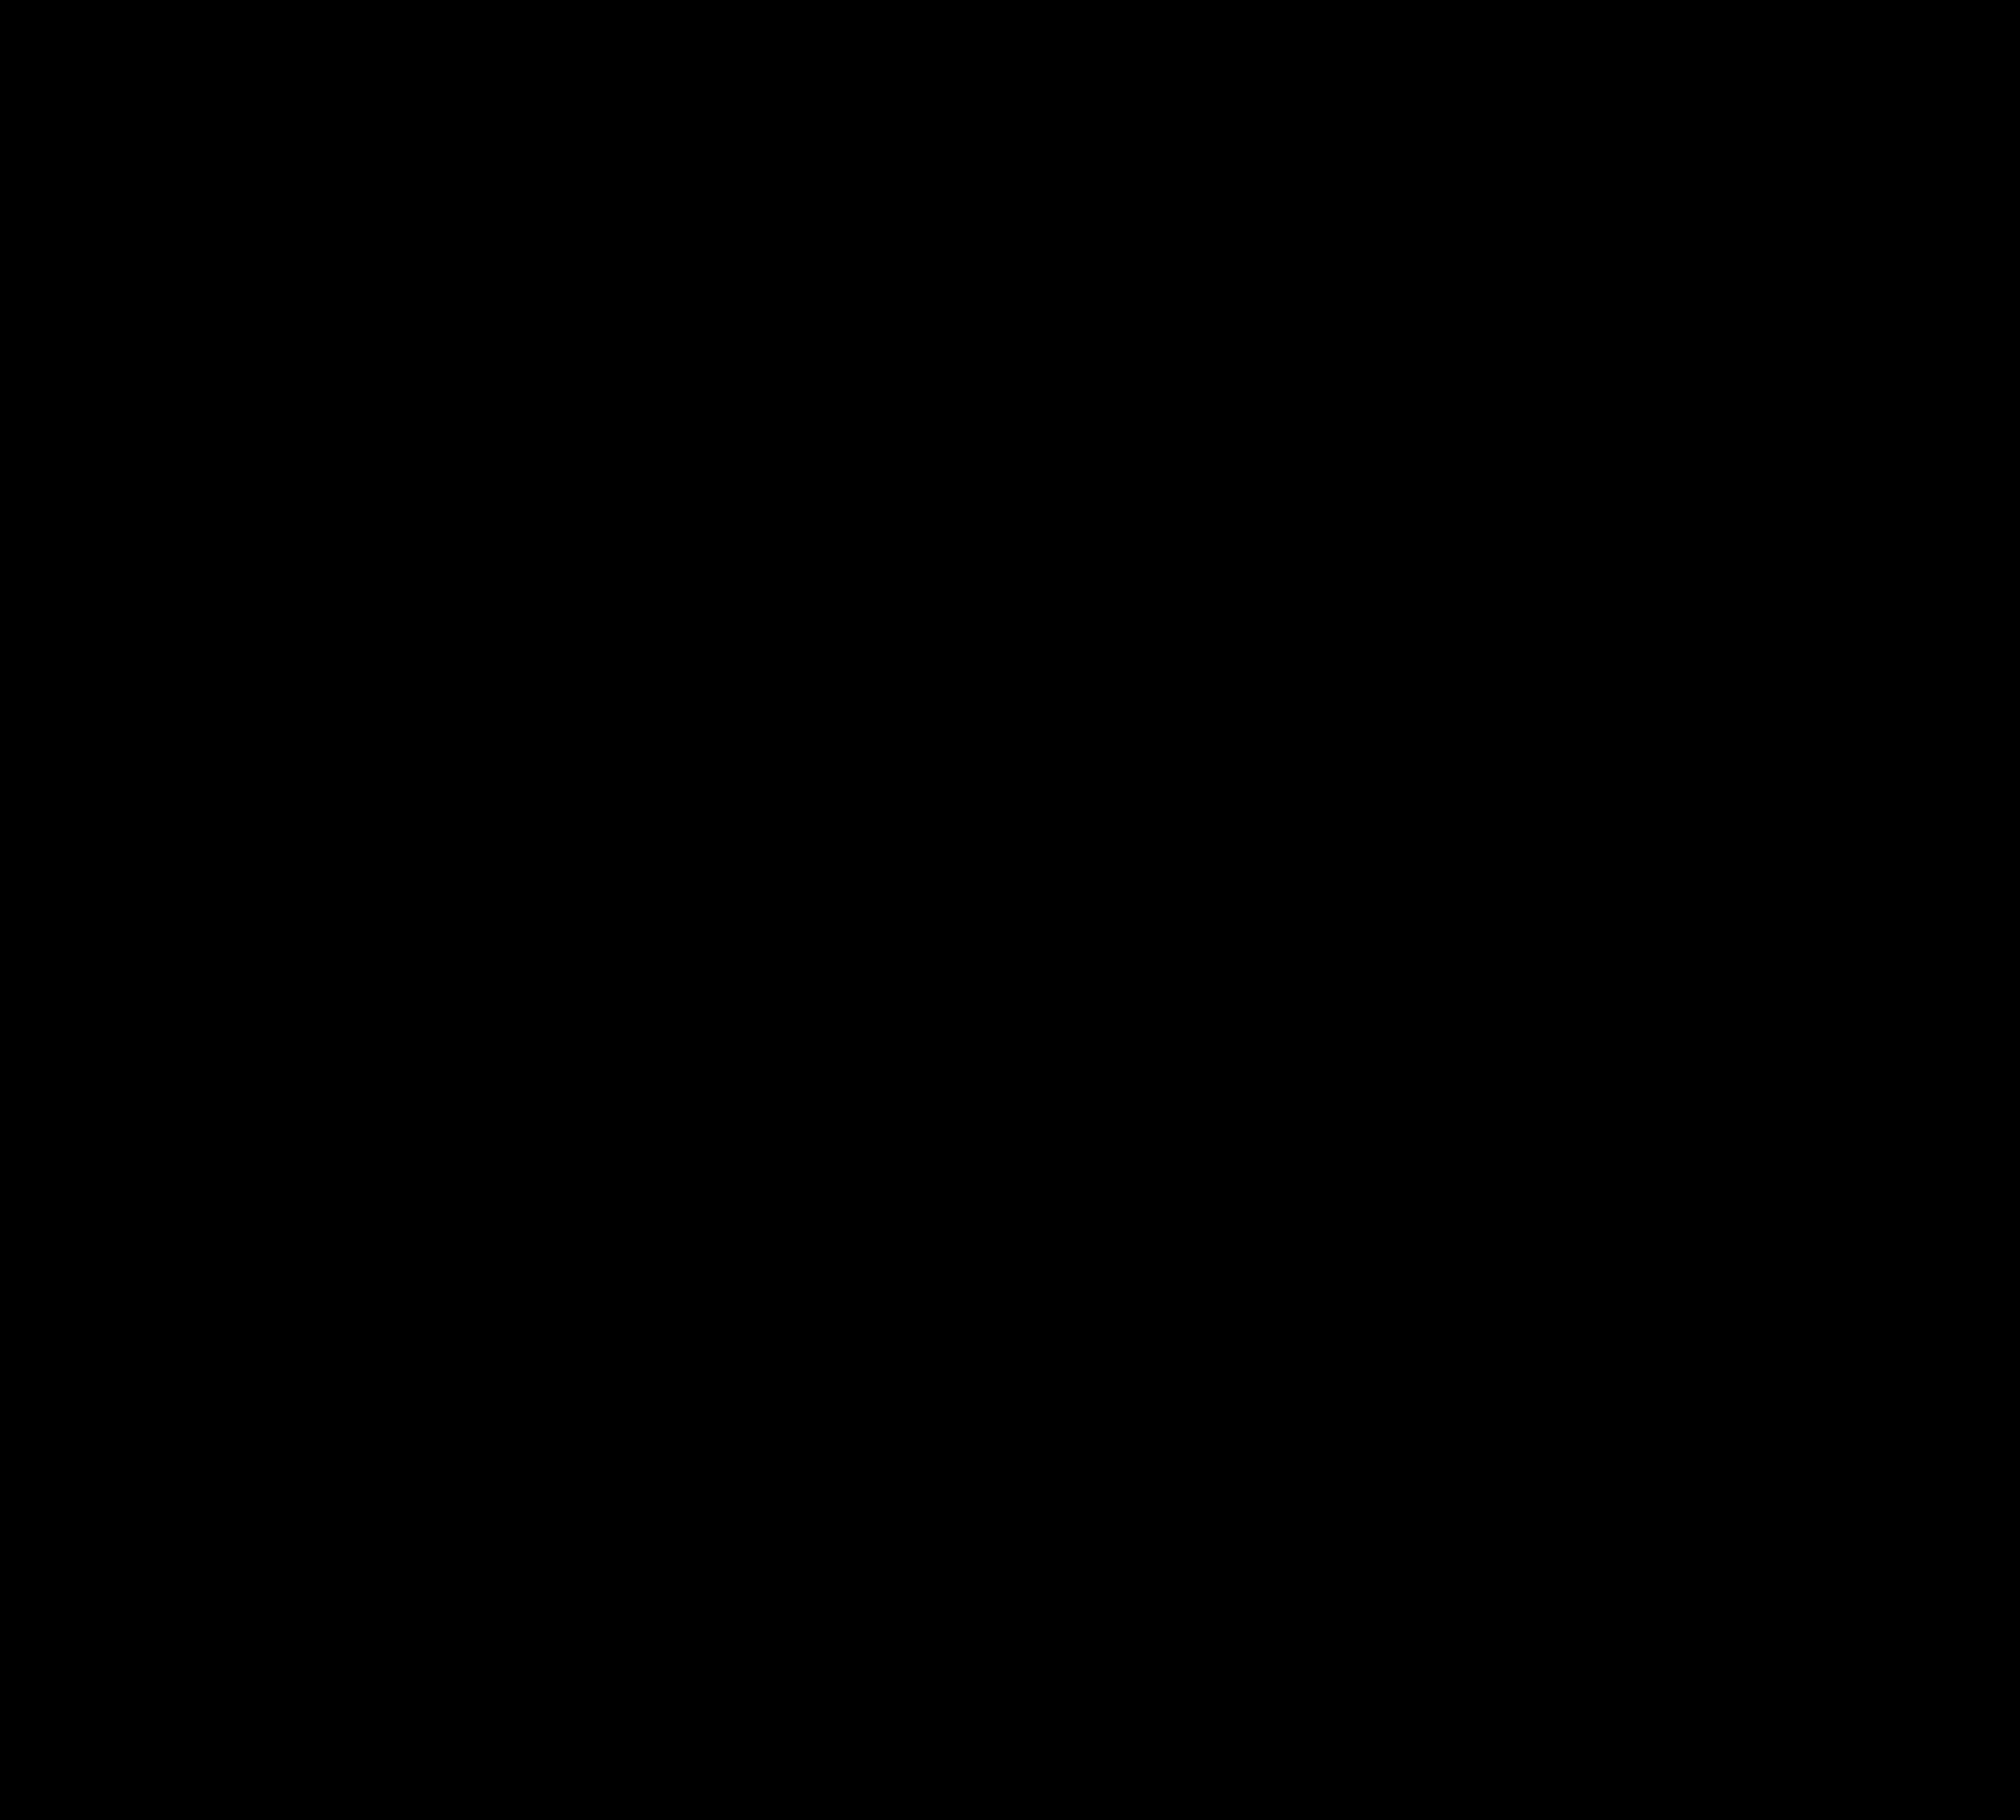 Turkey silhouette clipart cute clip art stock Ambitious small family people clipart - ClipartFox clip art stock